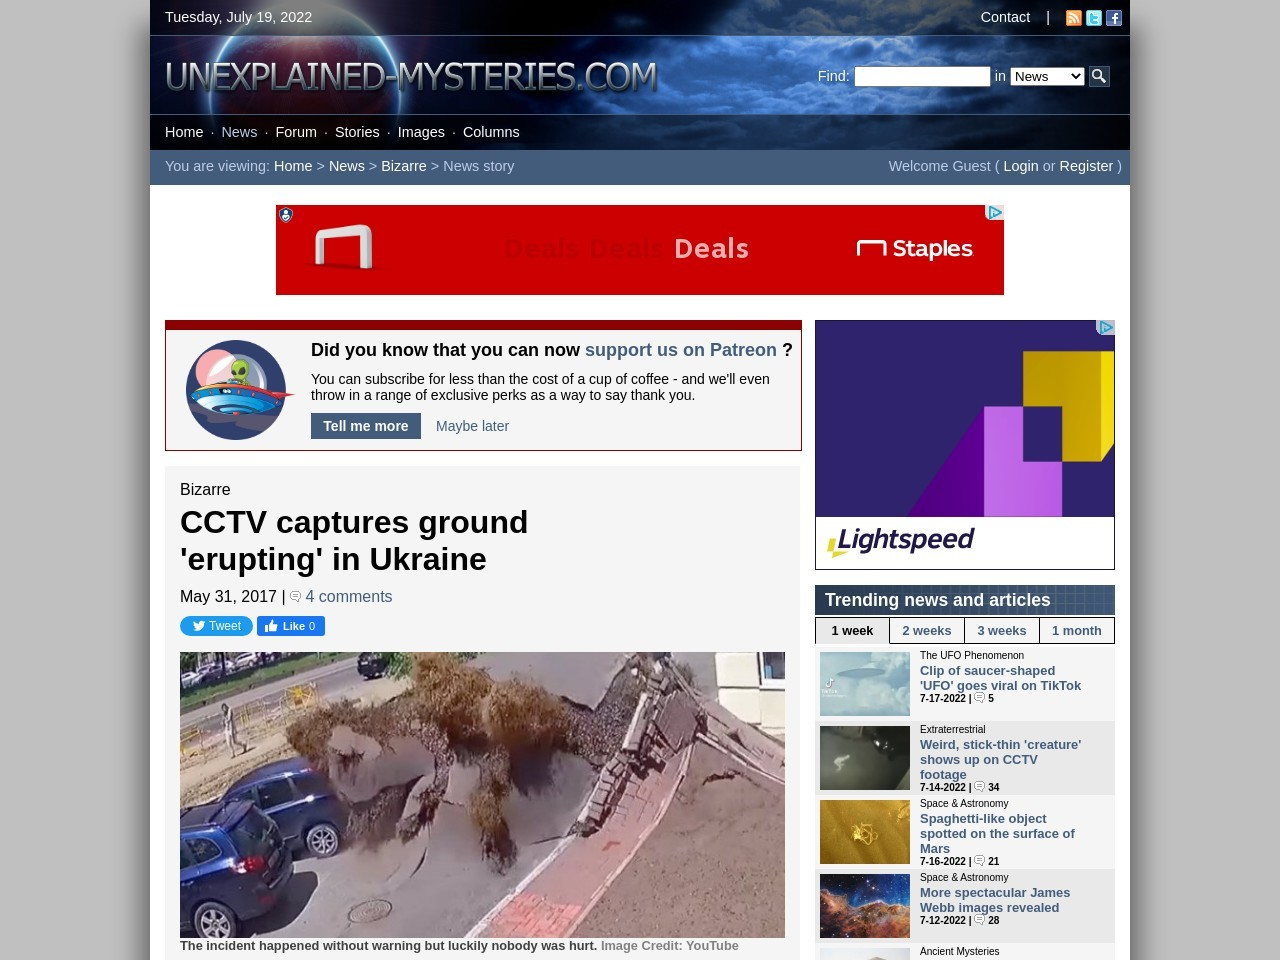 CCTV captures ground 'erupting' in Ukraine